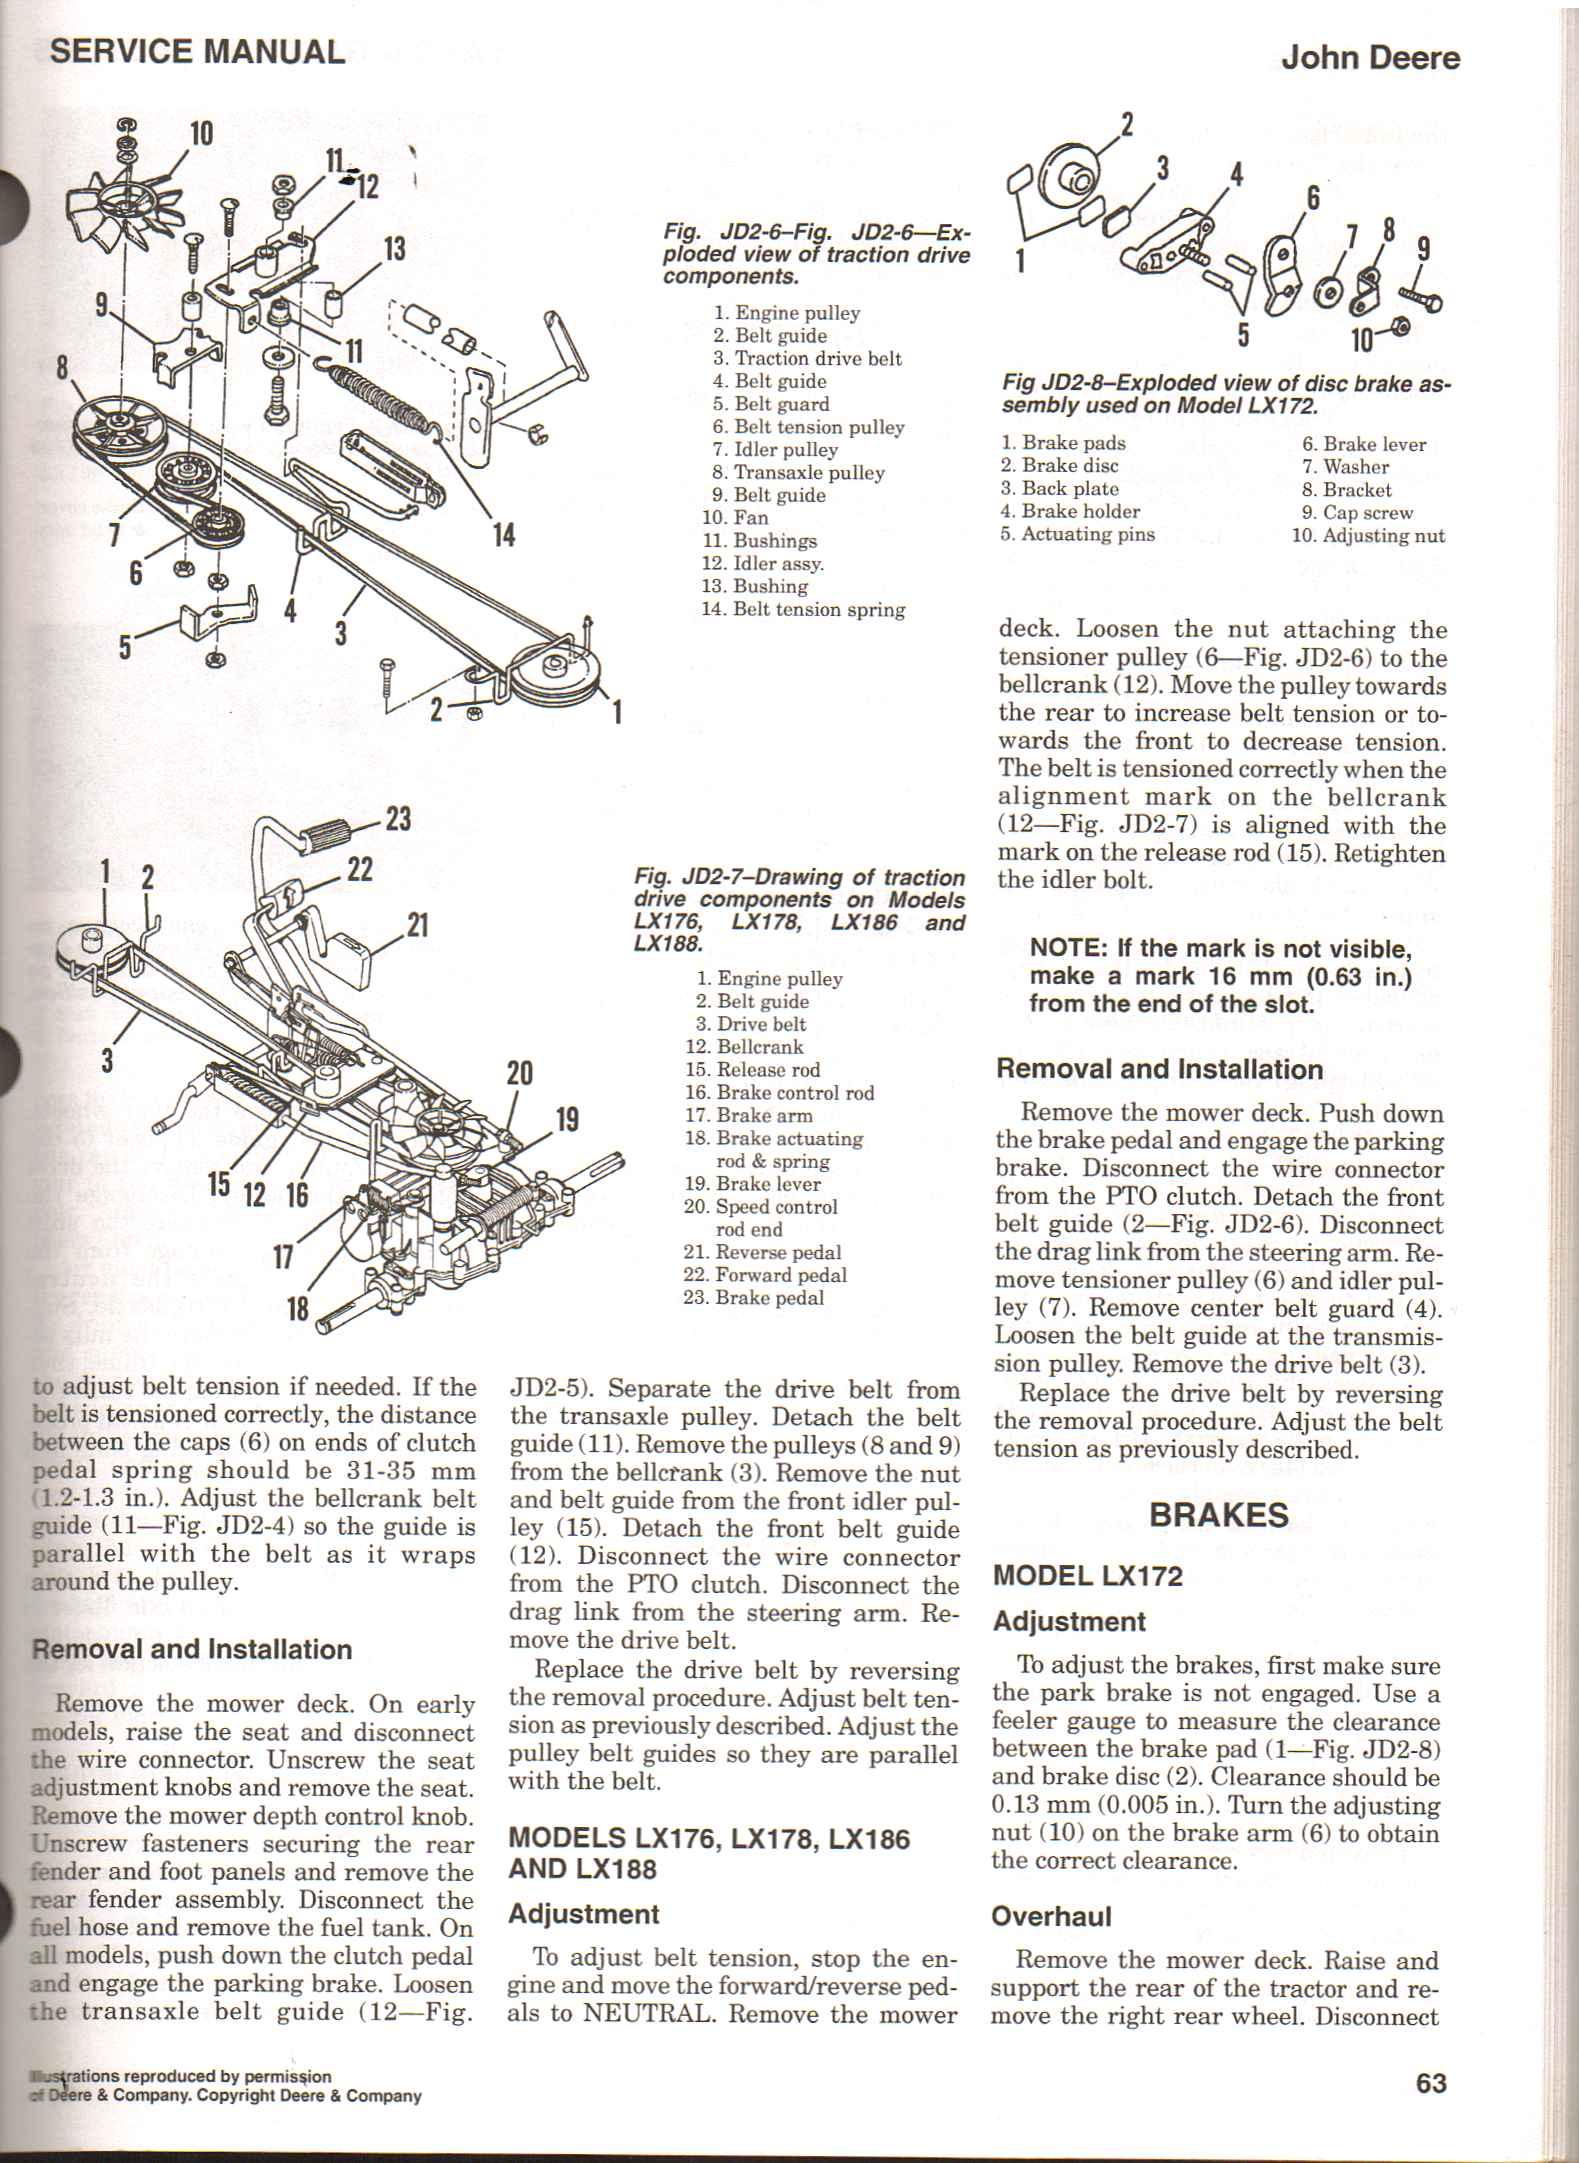 How Do Change Drive Belt On Lx188